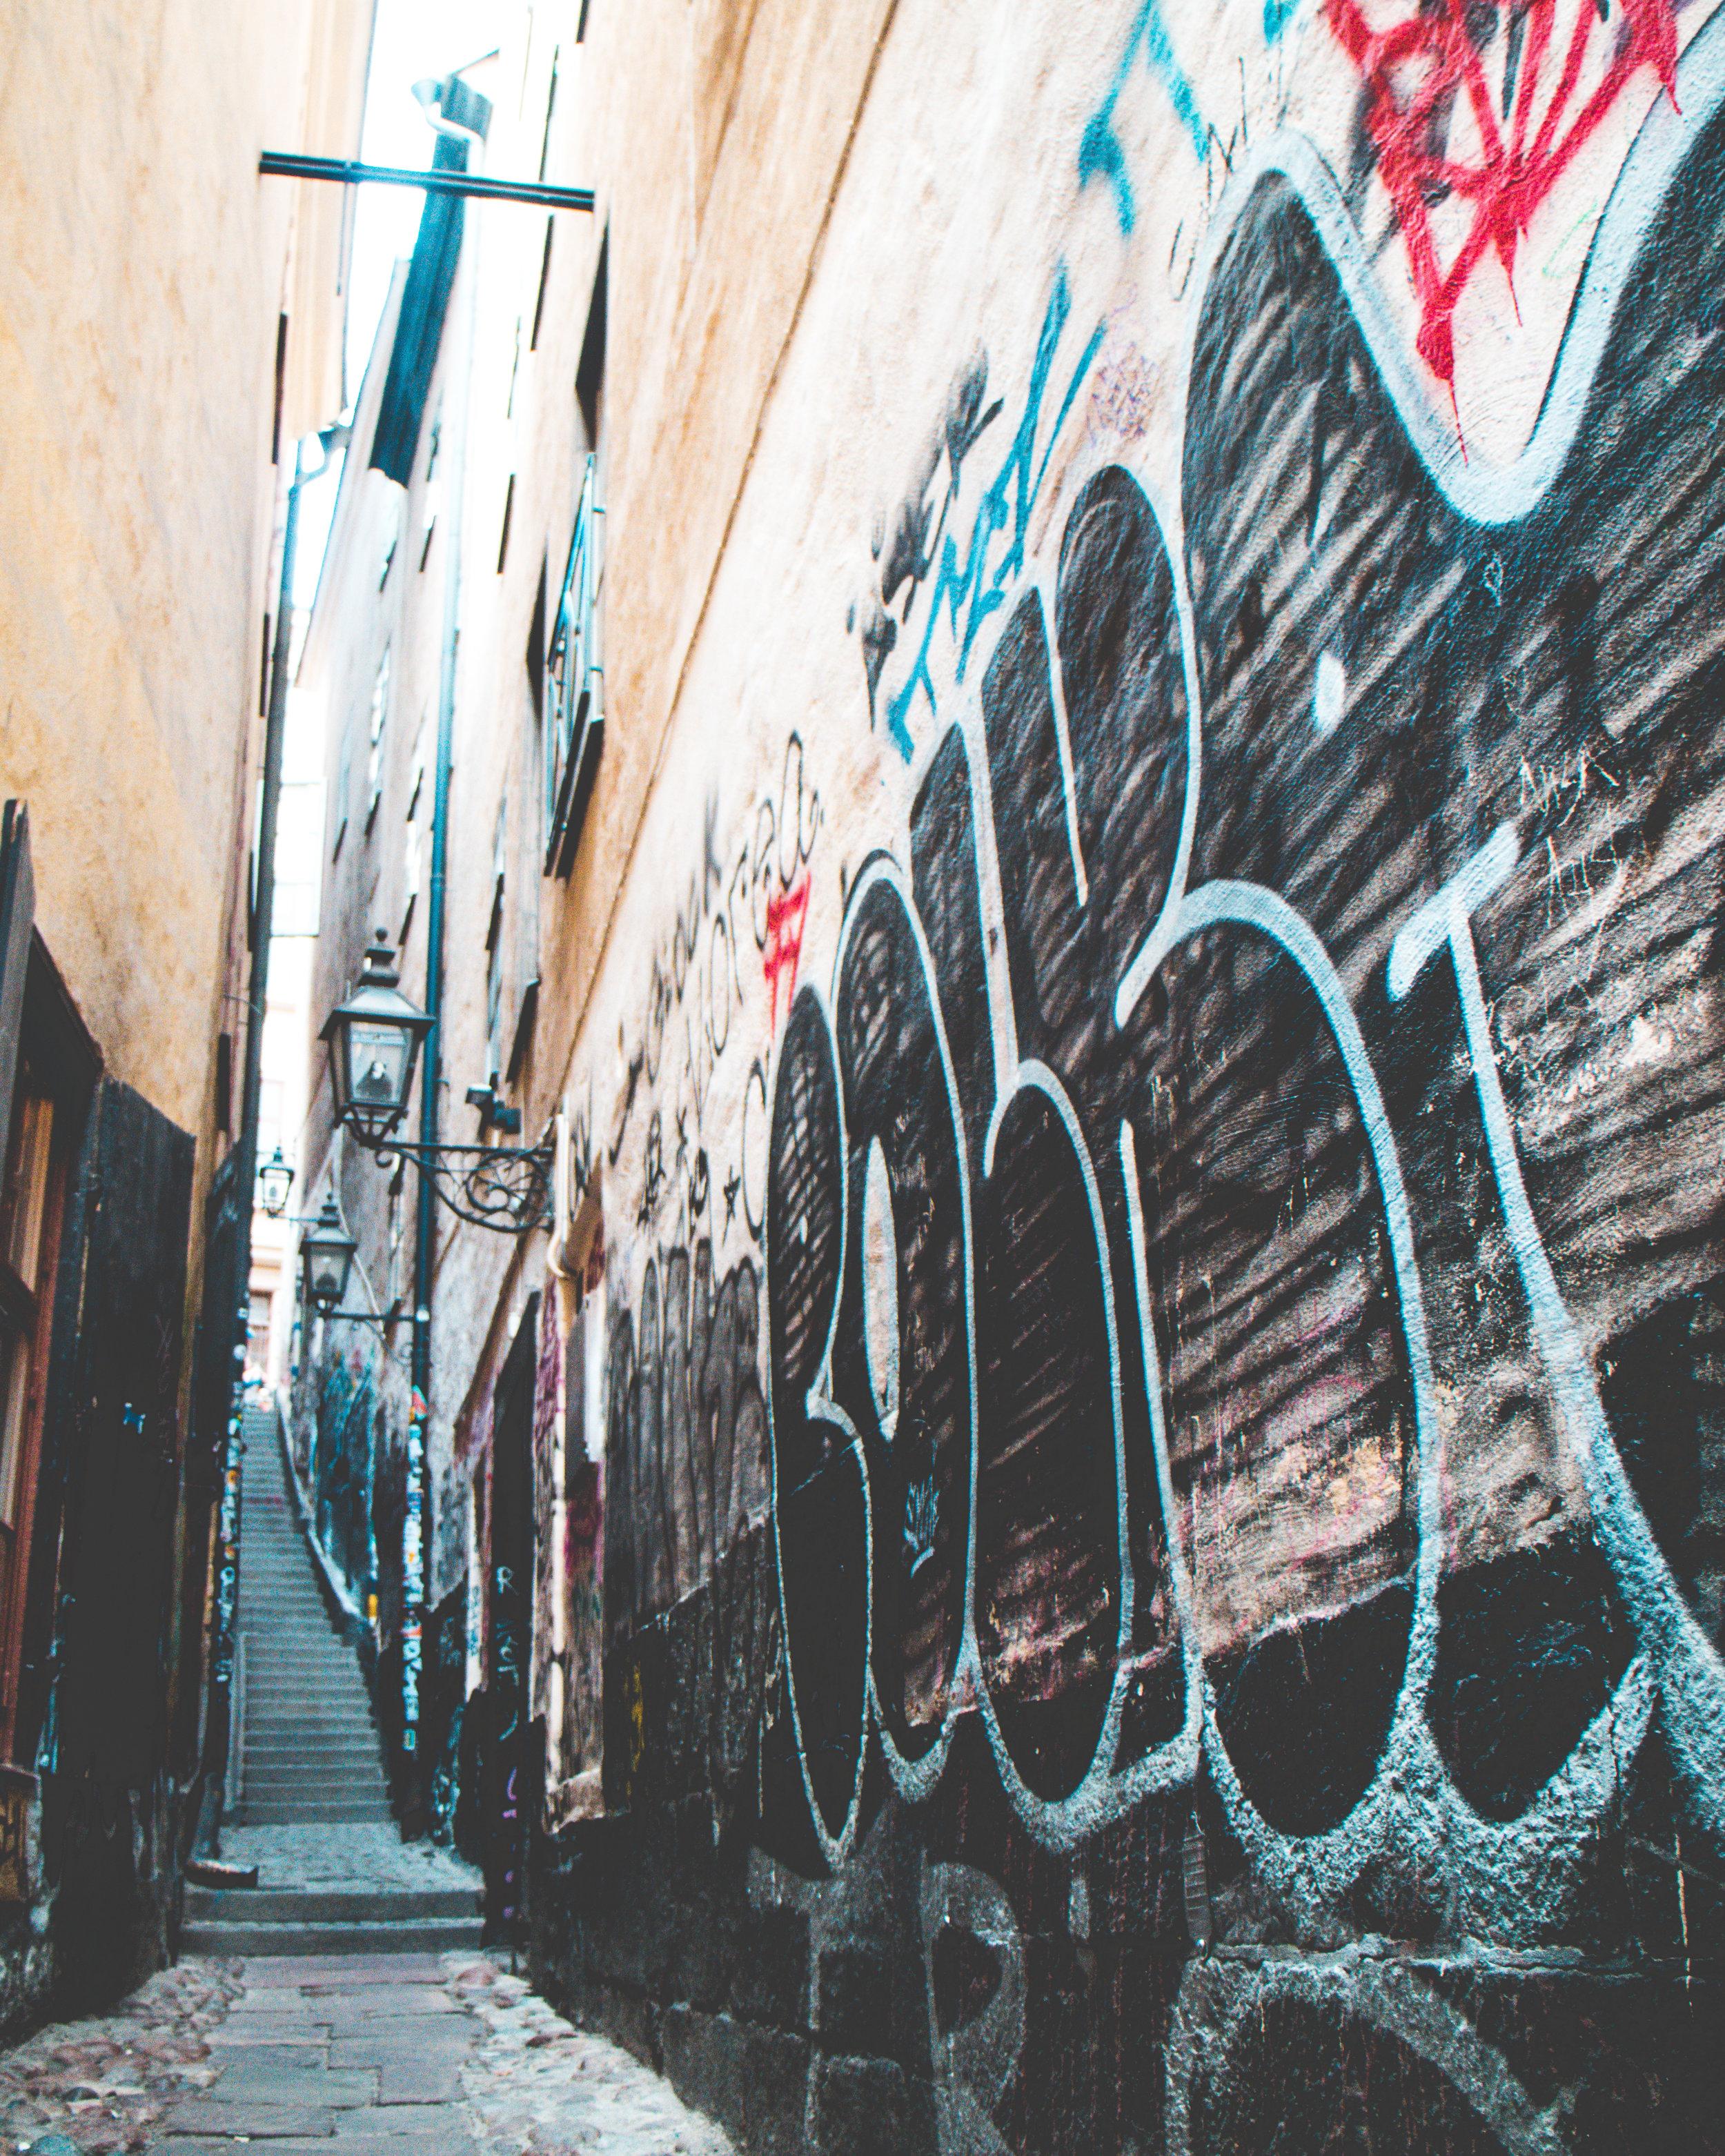 Gränd i gamlastan/Alley in the old town